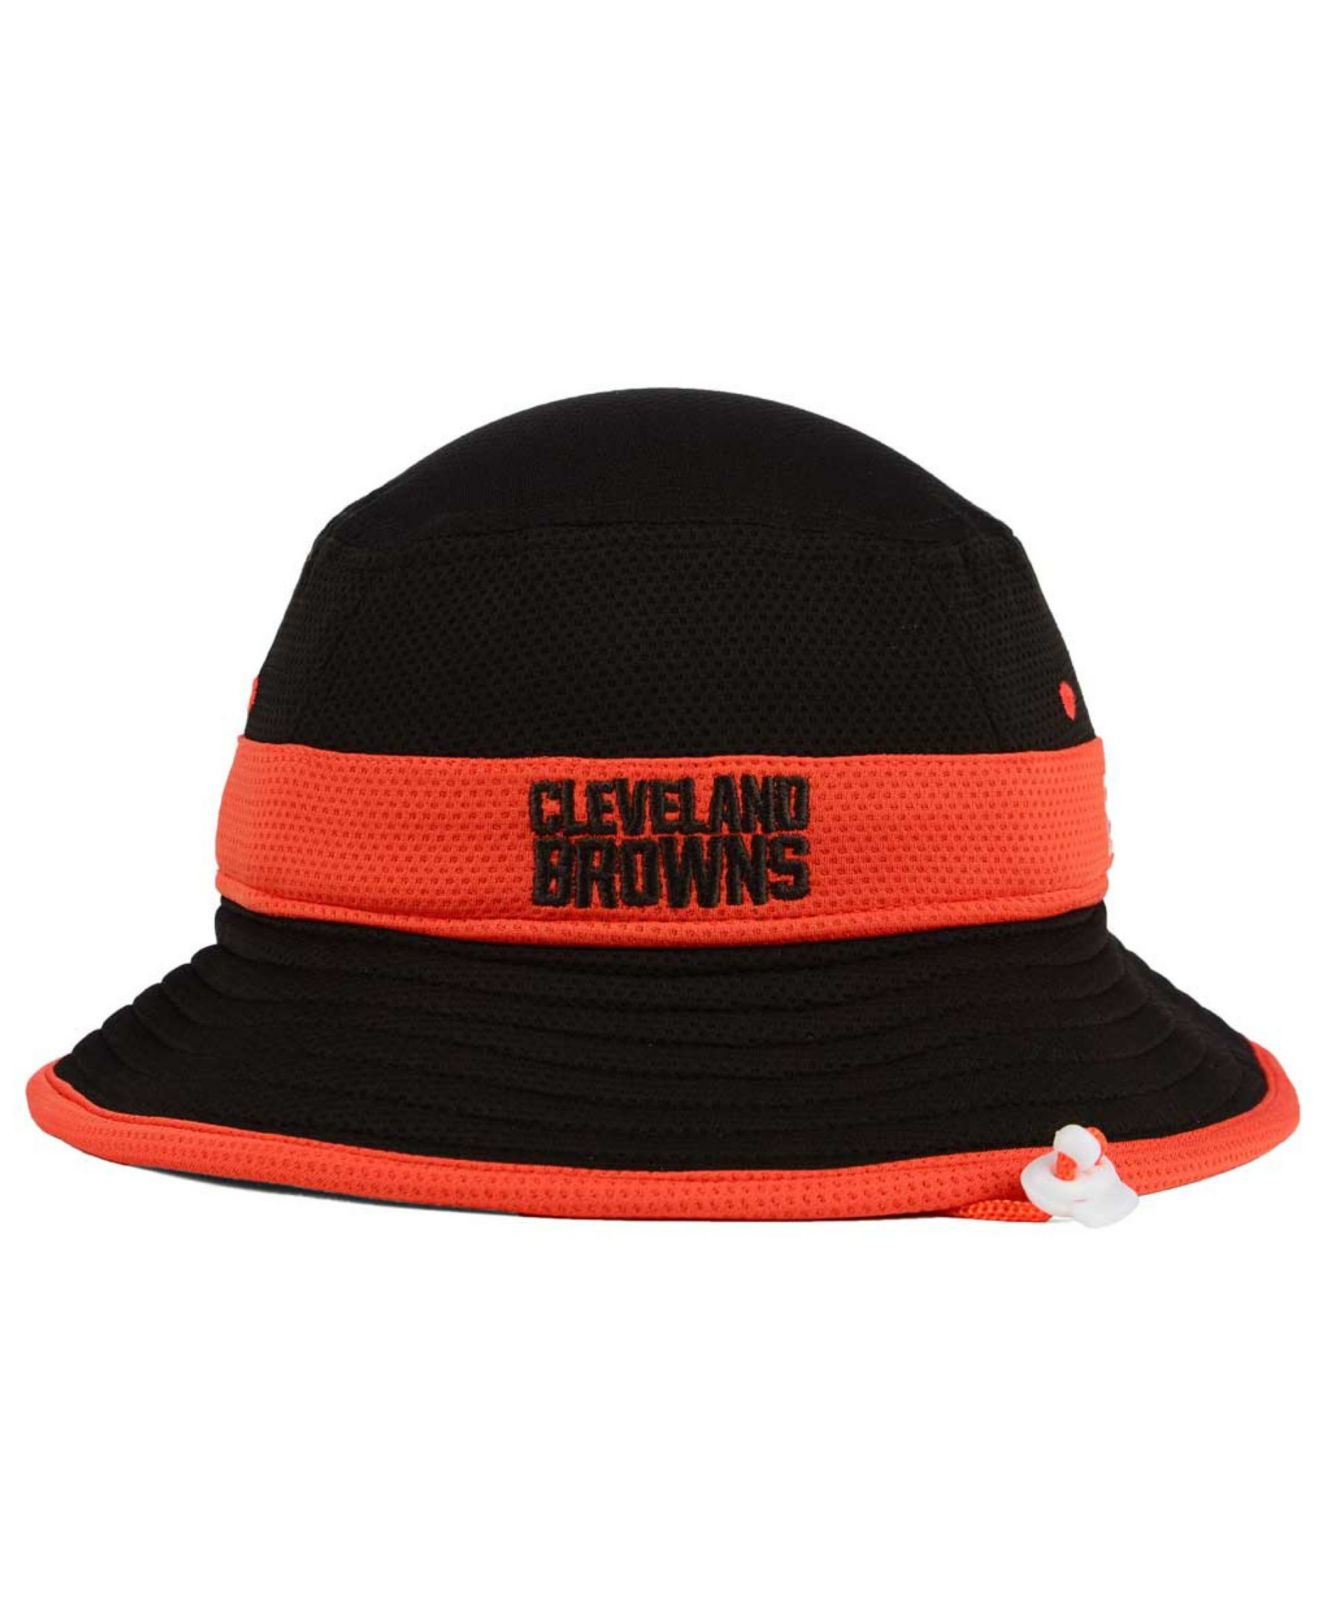 43528c394a8 Lyst - KTZ Cleveland Browns Training Camp Reverse Bucket Hat in ...